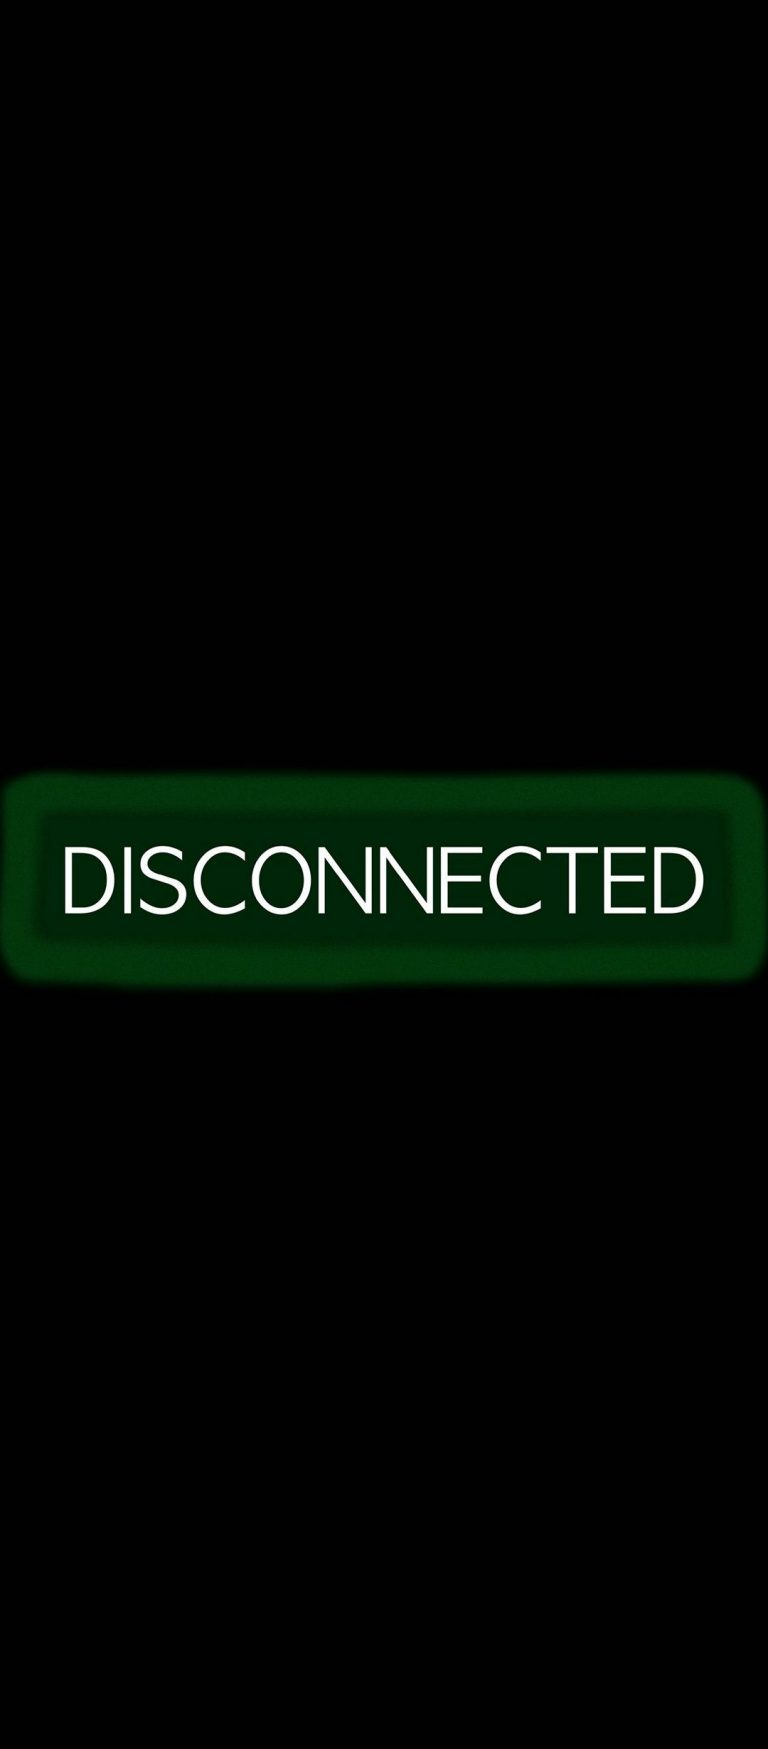 Disconnected Disconnect Inscription 1080x2460 768x1749